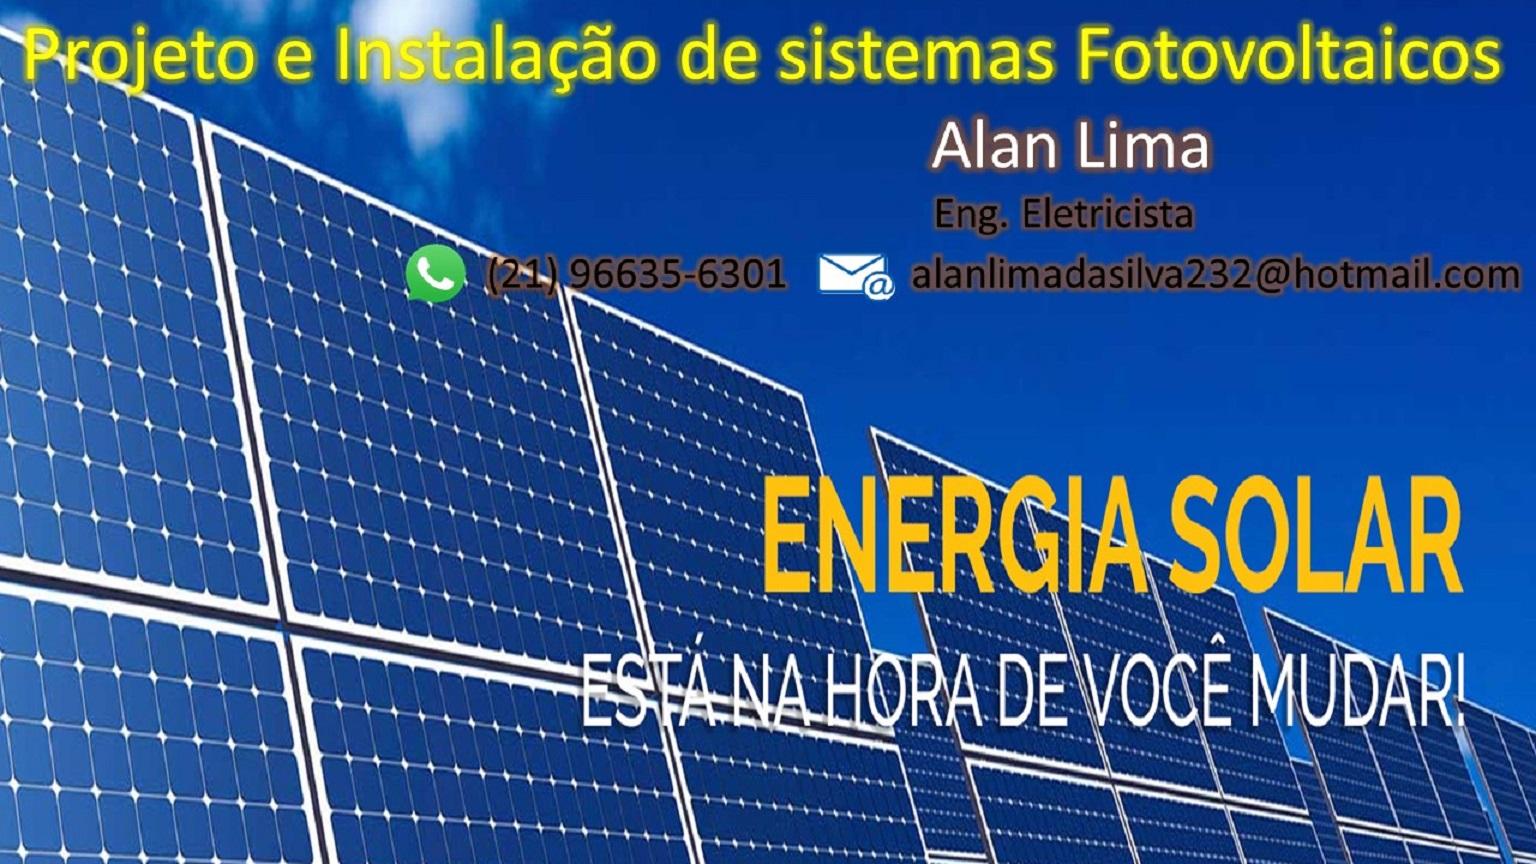 FAÇA SEU PROJETO DE ENERGIA SOLAR